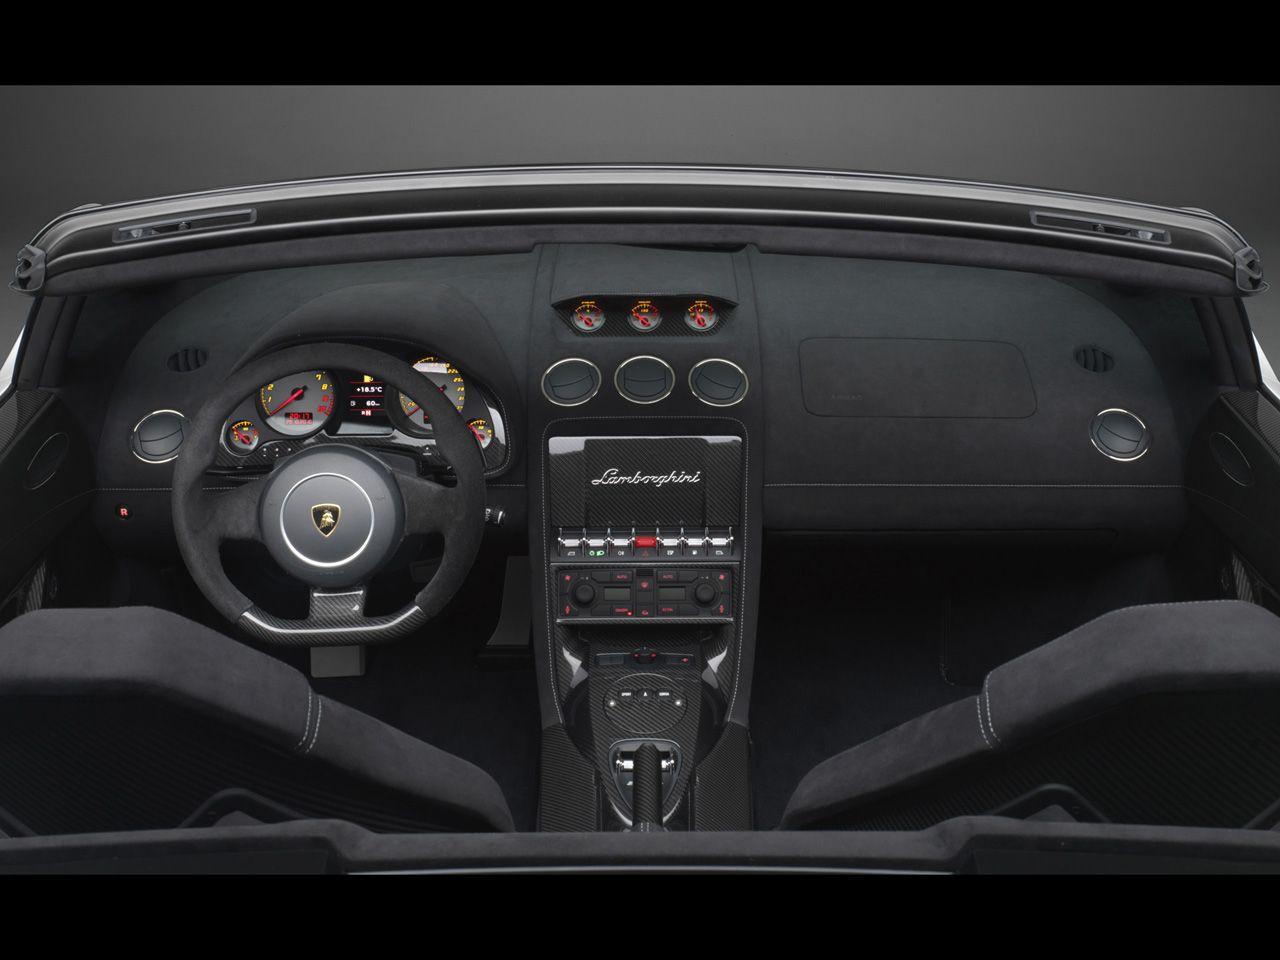 2011 Lamborghini Gallardo Lp 570 4 Spyder Performante Dashboard